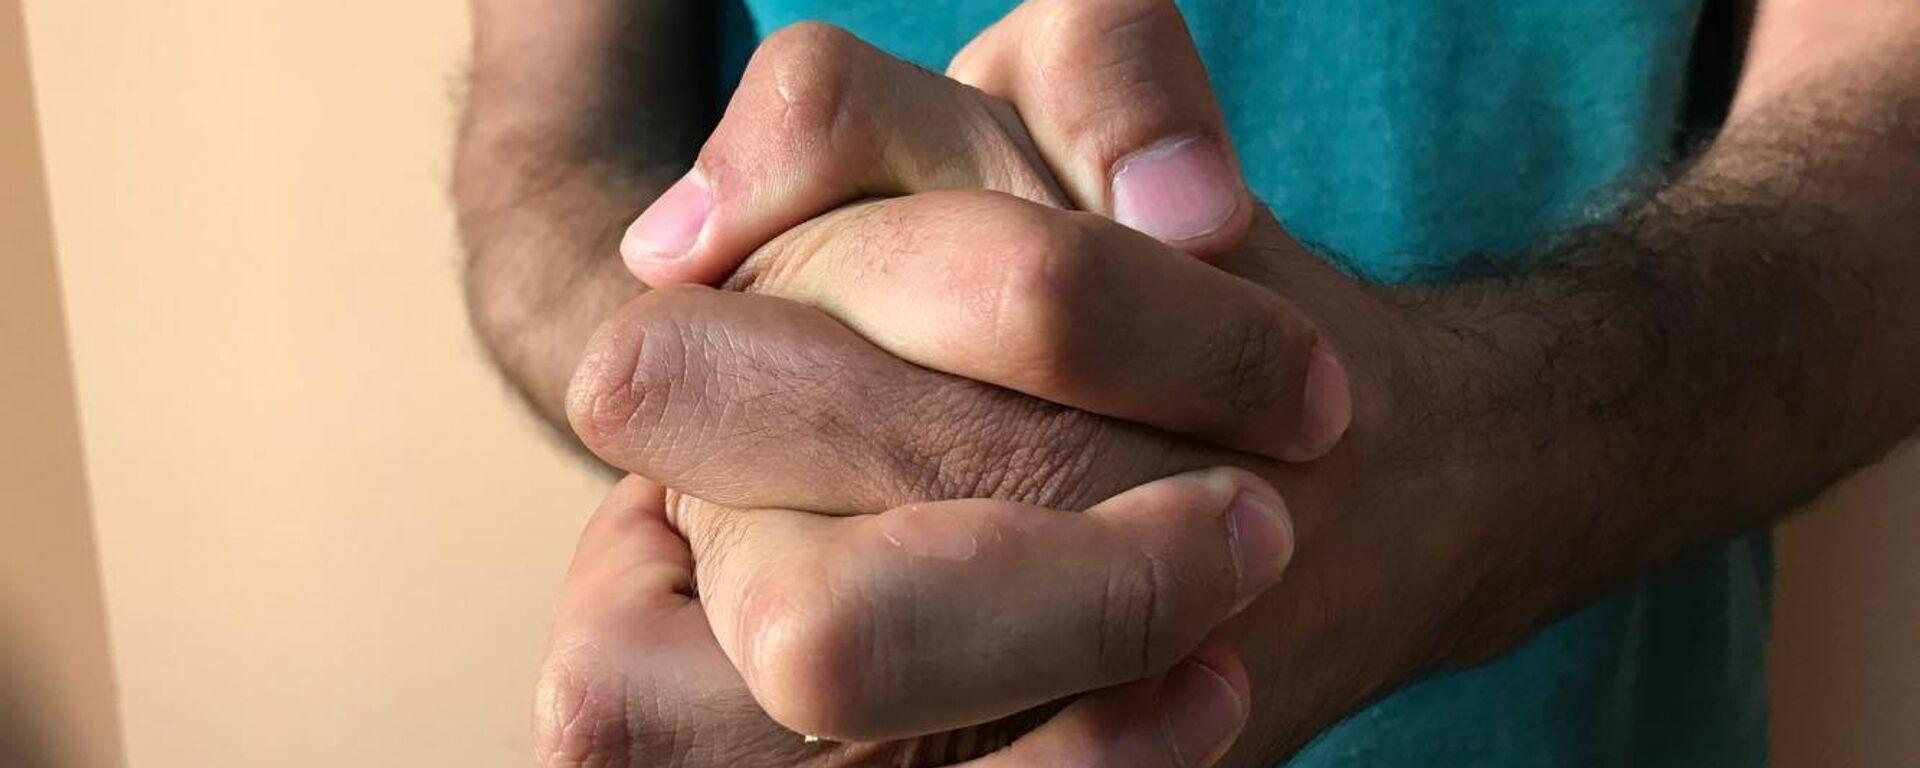 Руки, пальцы - Sputnik Արմենիա, 1920, 19.09.2021